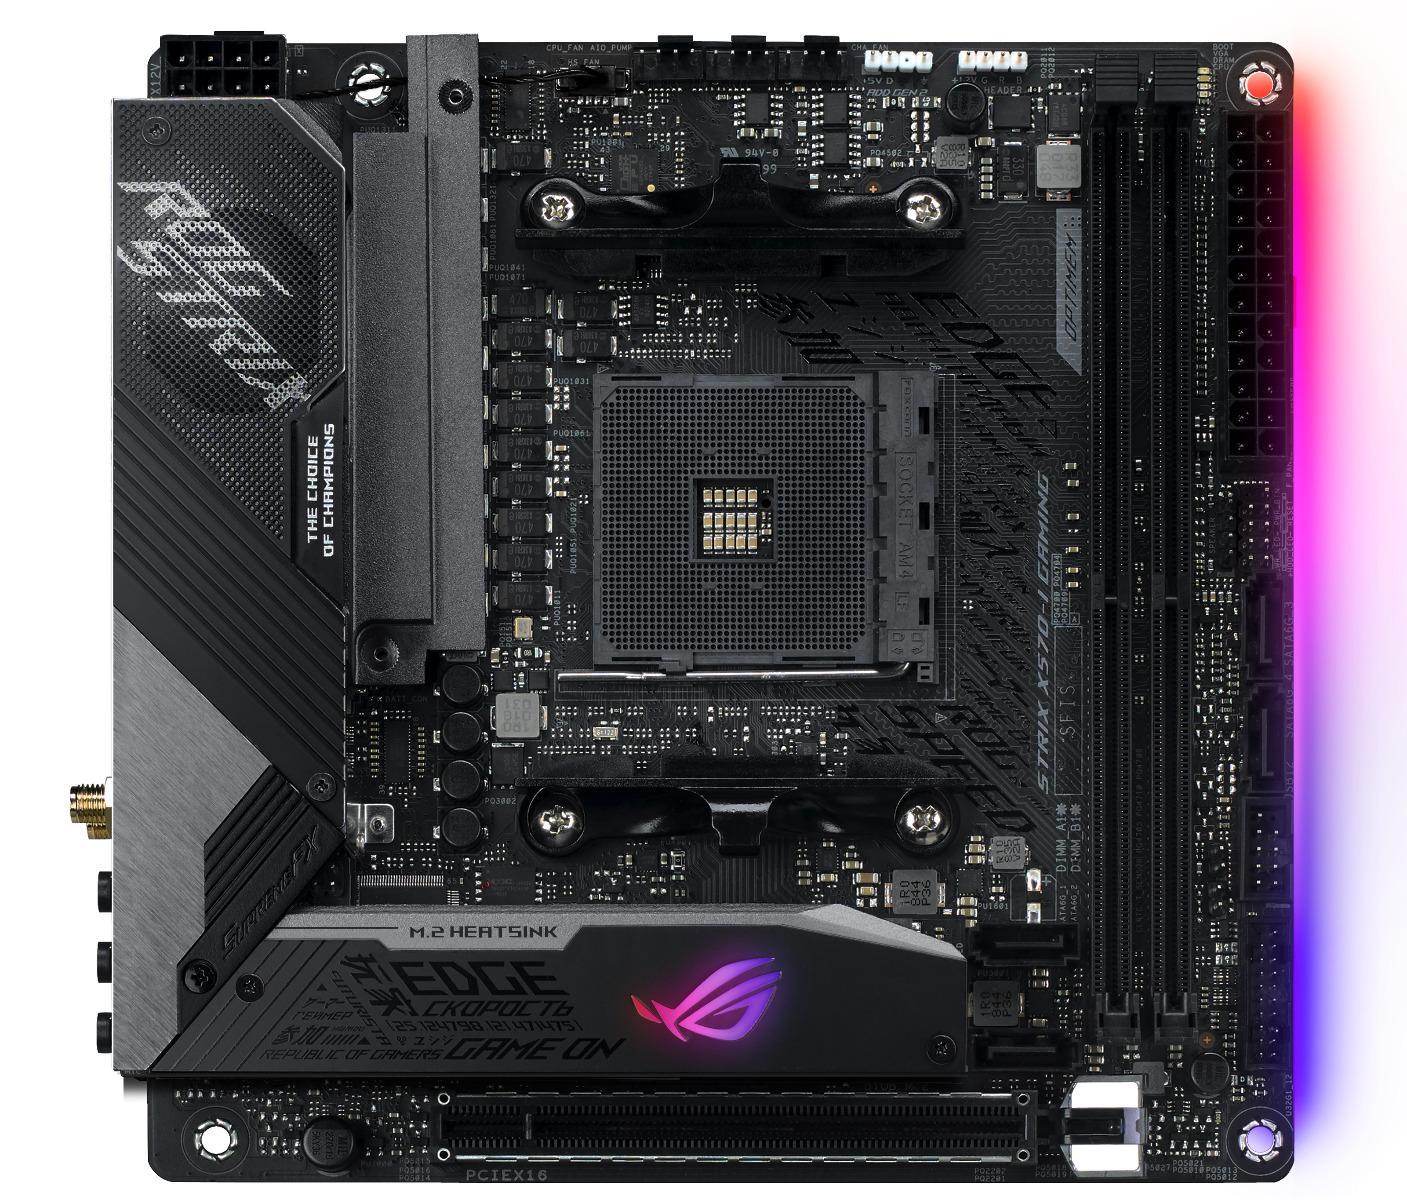 Asus ROG Strix X570-I Gaming Mini ITX AM4 Motherboard